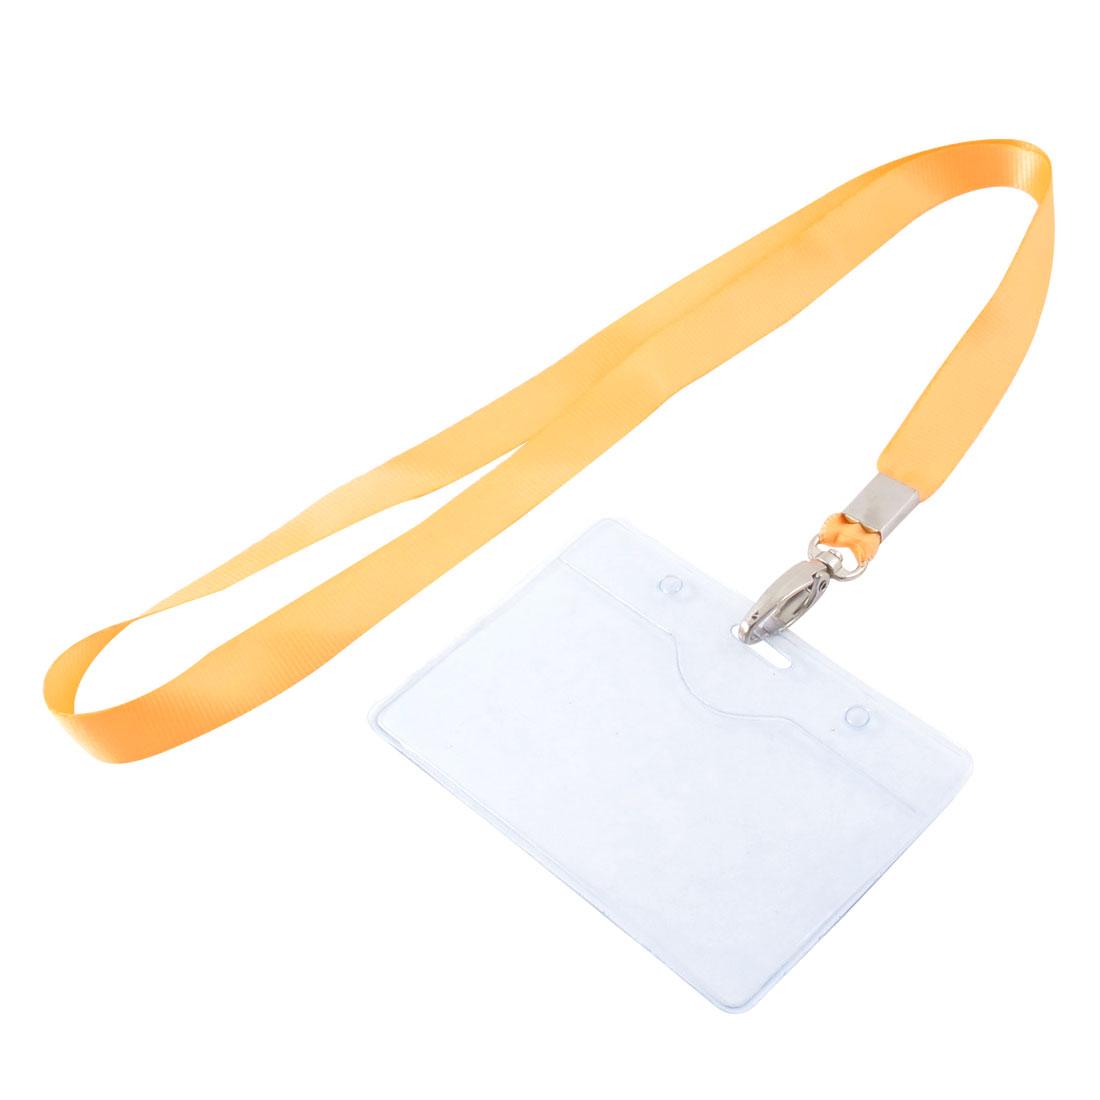 Neck Strap Plastic Horizontal ID Office Employee Badge Card Holder Orange Clear